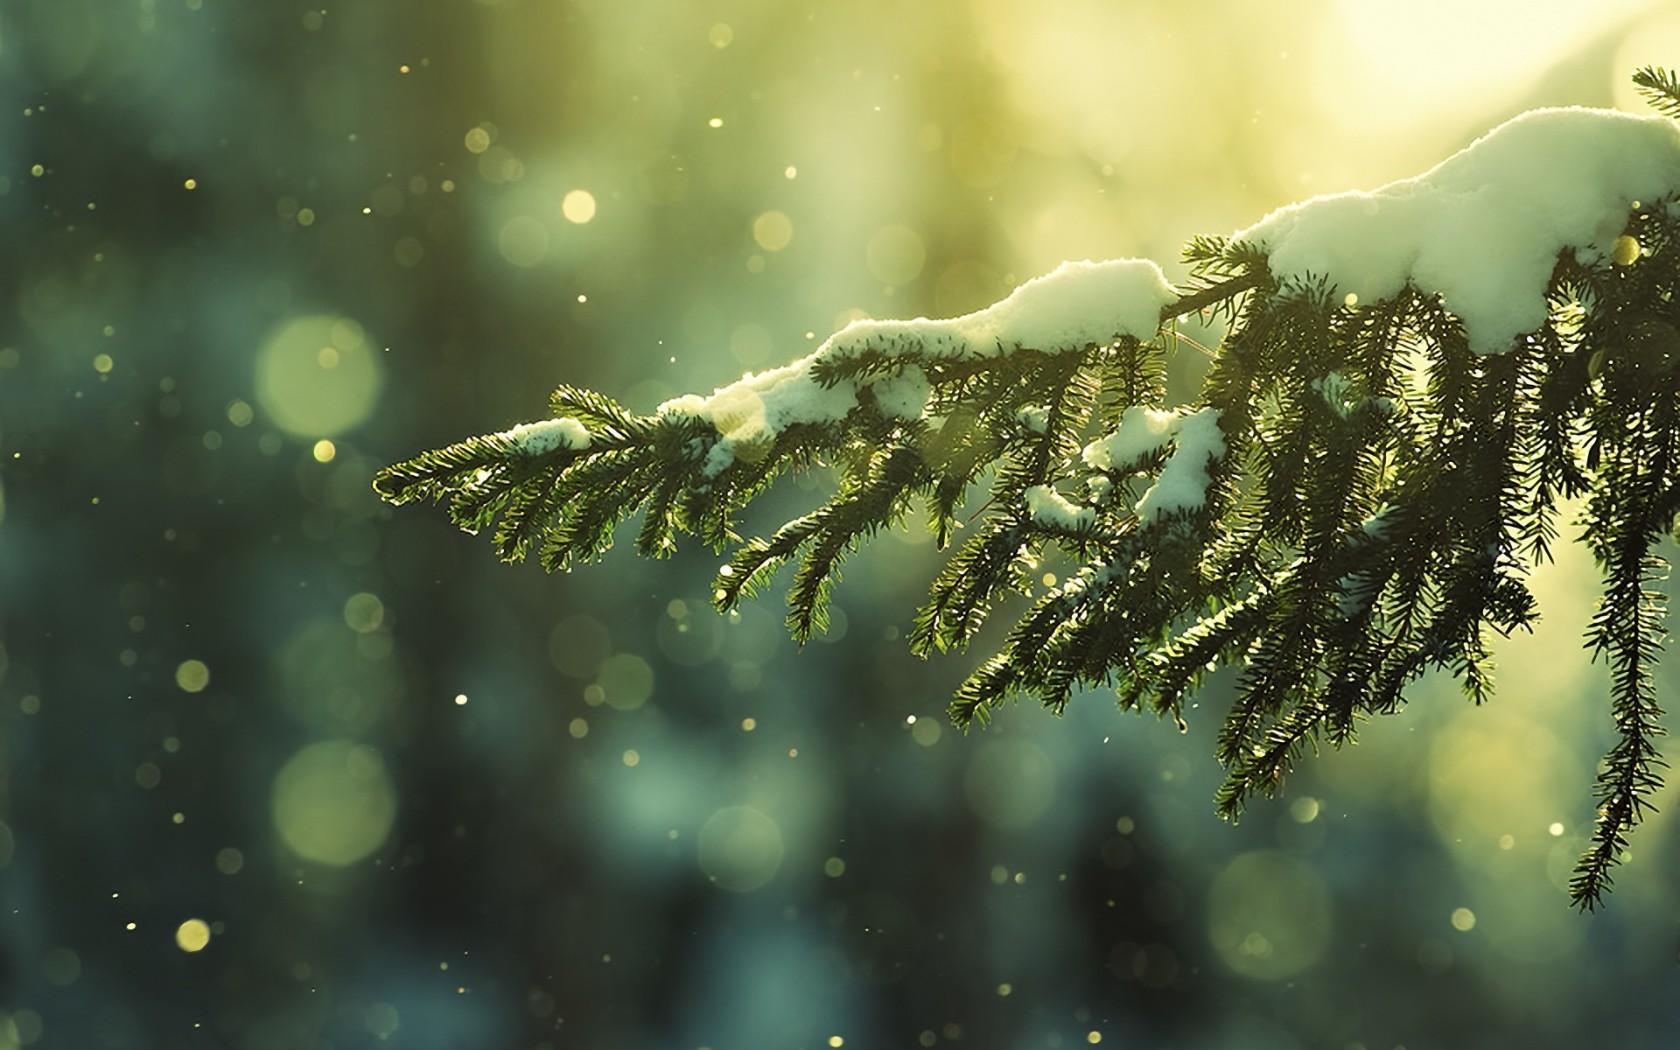 Previous, Holidays - Christmas wallpapers - Christmas Snow wallpaper